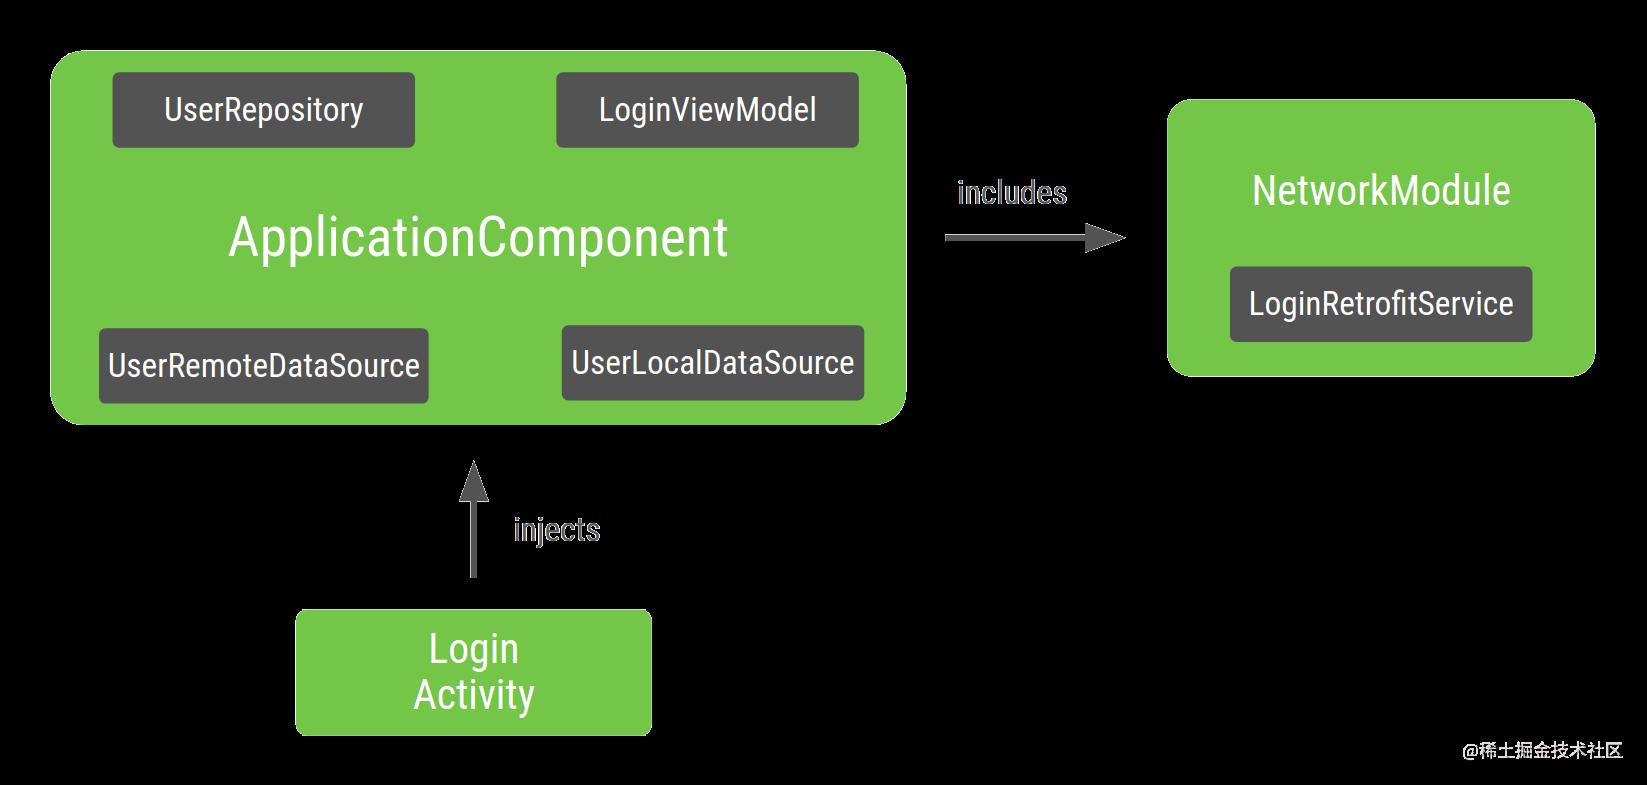 由 Dagger 注入 LoginActivity 的图的表示法